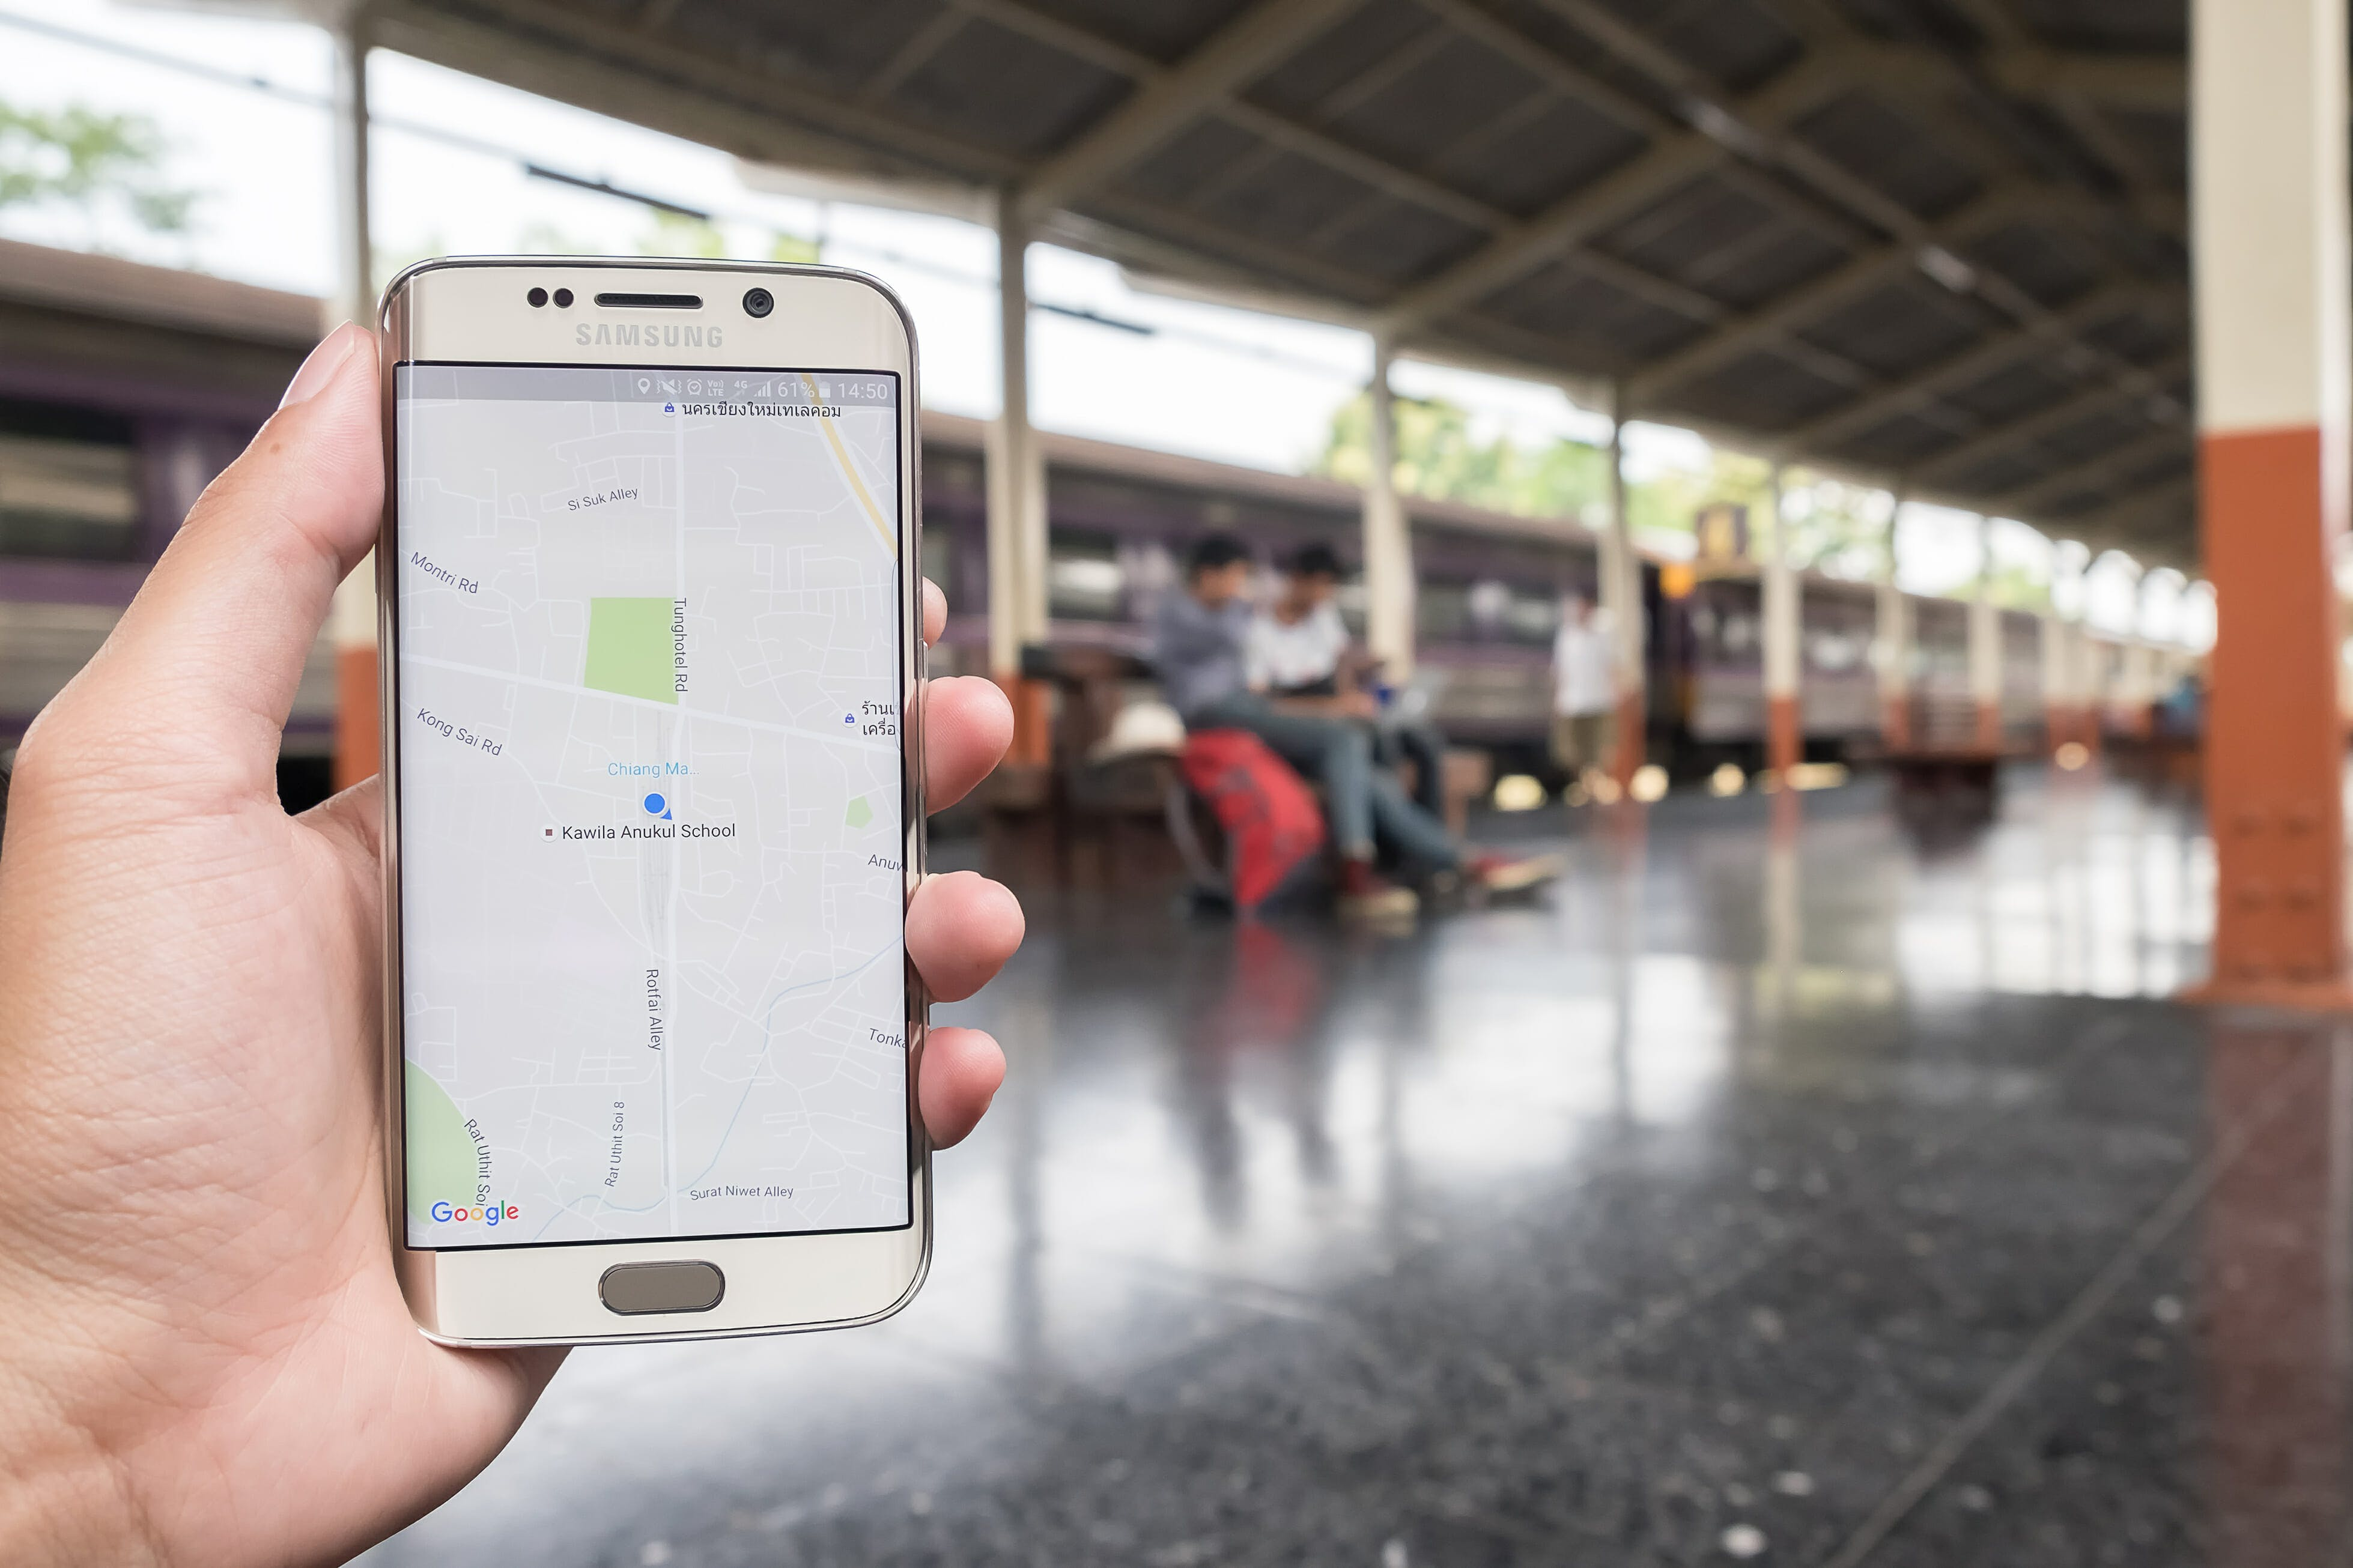 samsung galaxy s6 edge with Google Maps